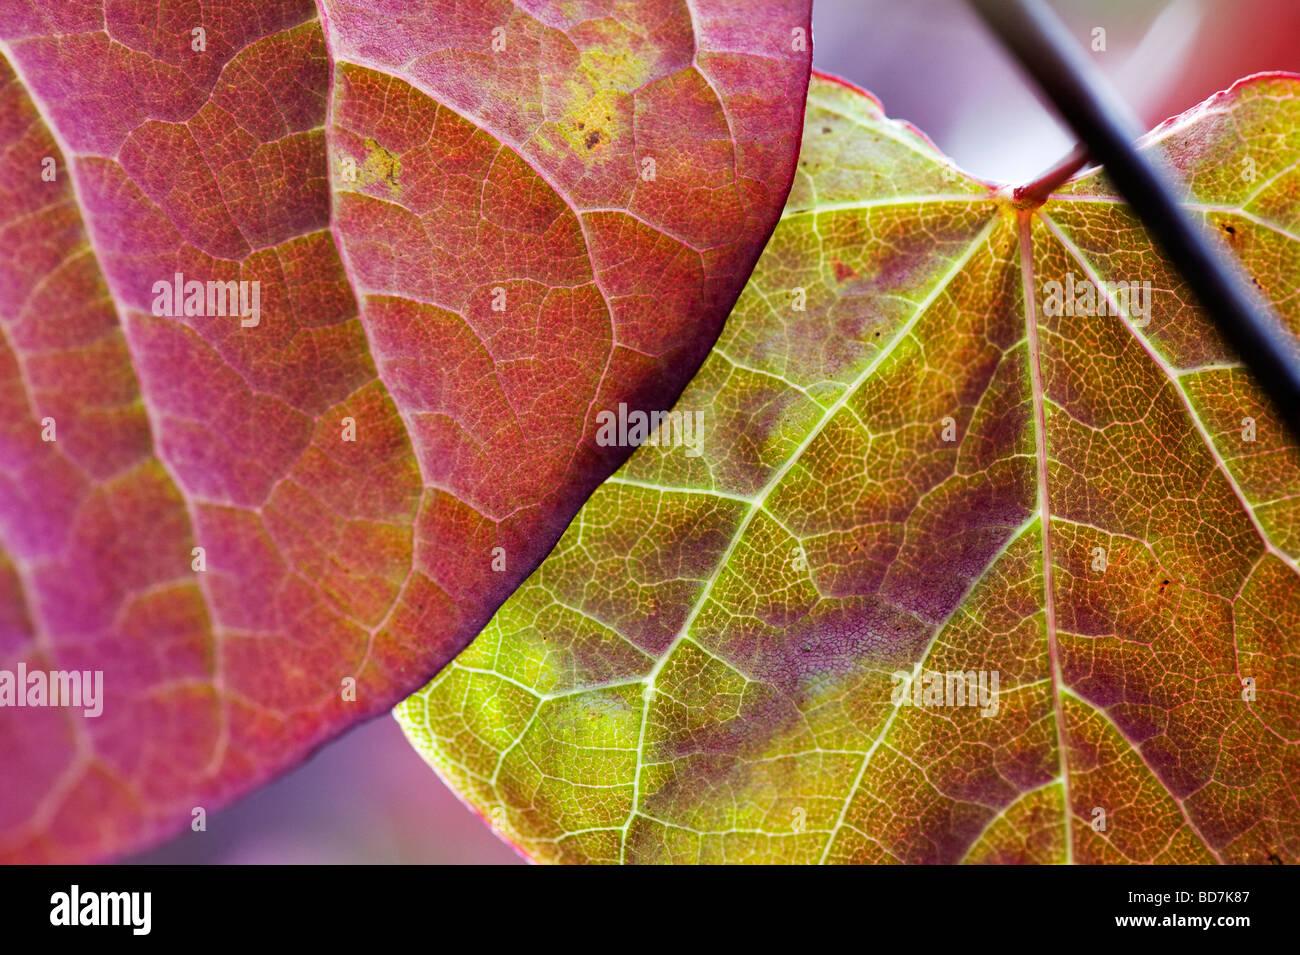 Cercis canadensis 'Forest pansy'. Eastern Redbud foglie di albero Immagini Stock